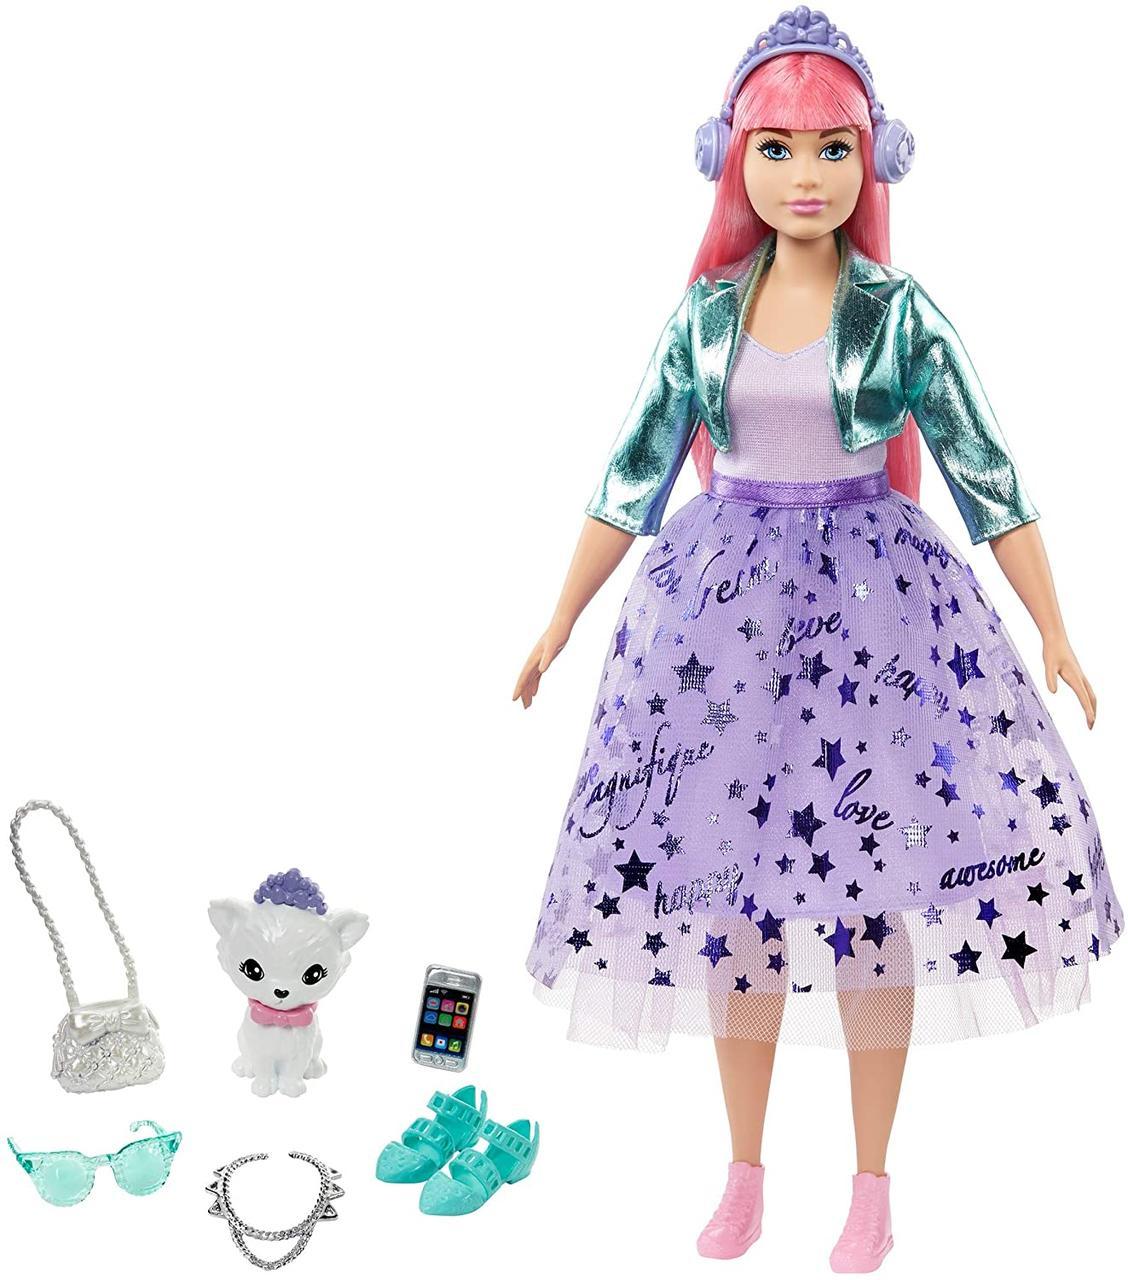 Кукла Барби Приключения Принцессы Дейзи